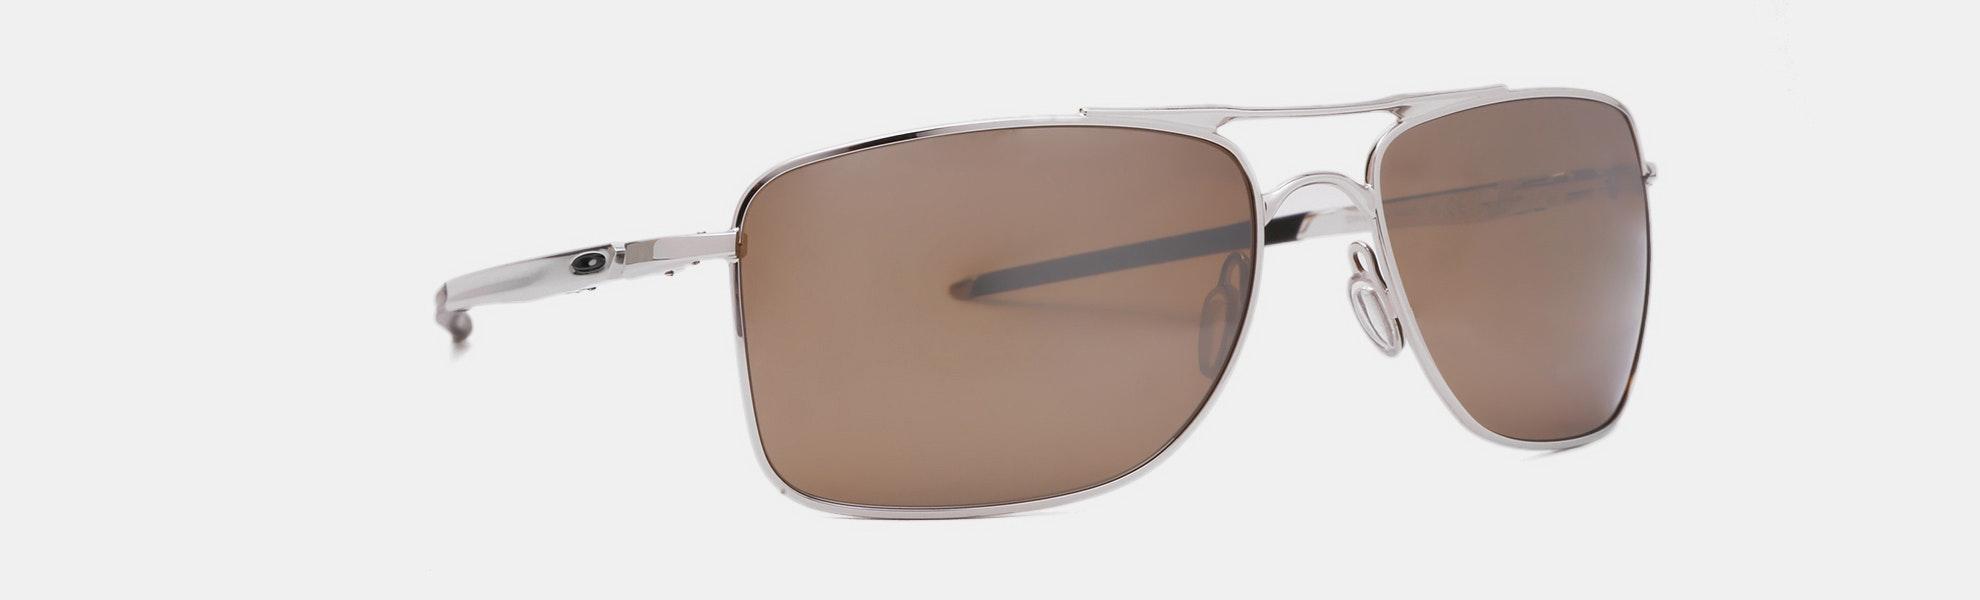 Oakley Gauge 8 L Polarized Sunglasses